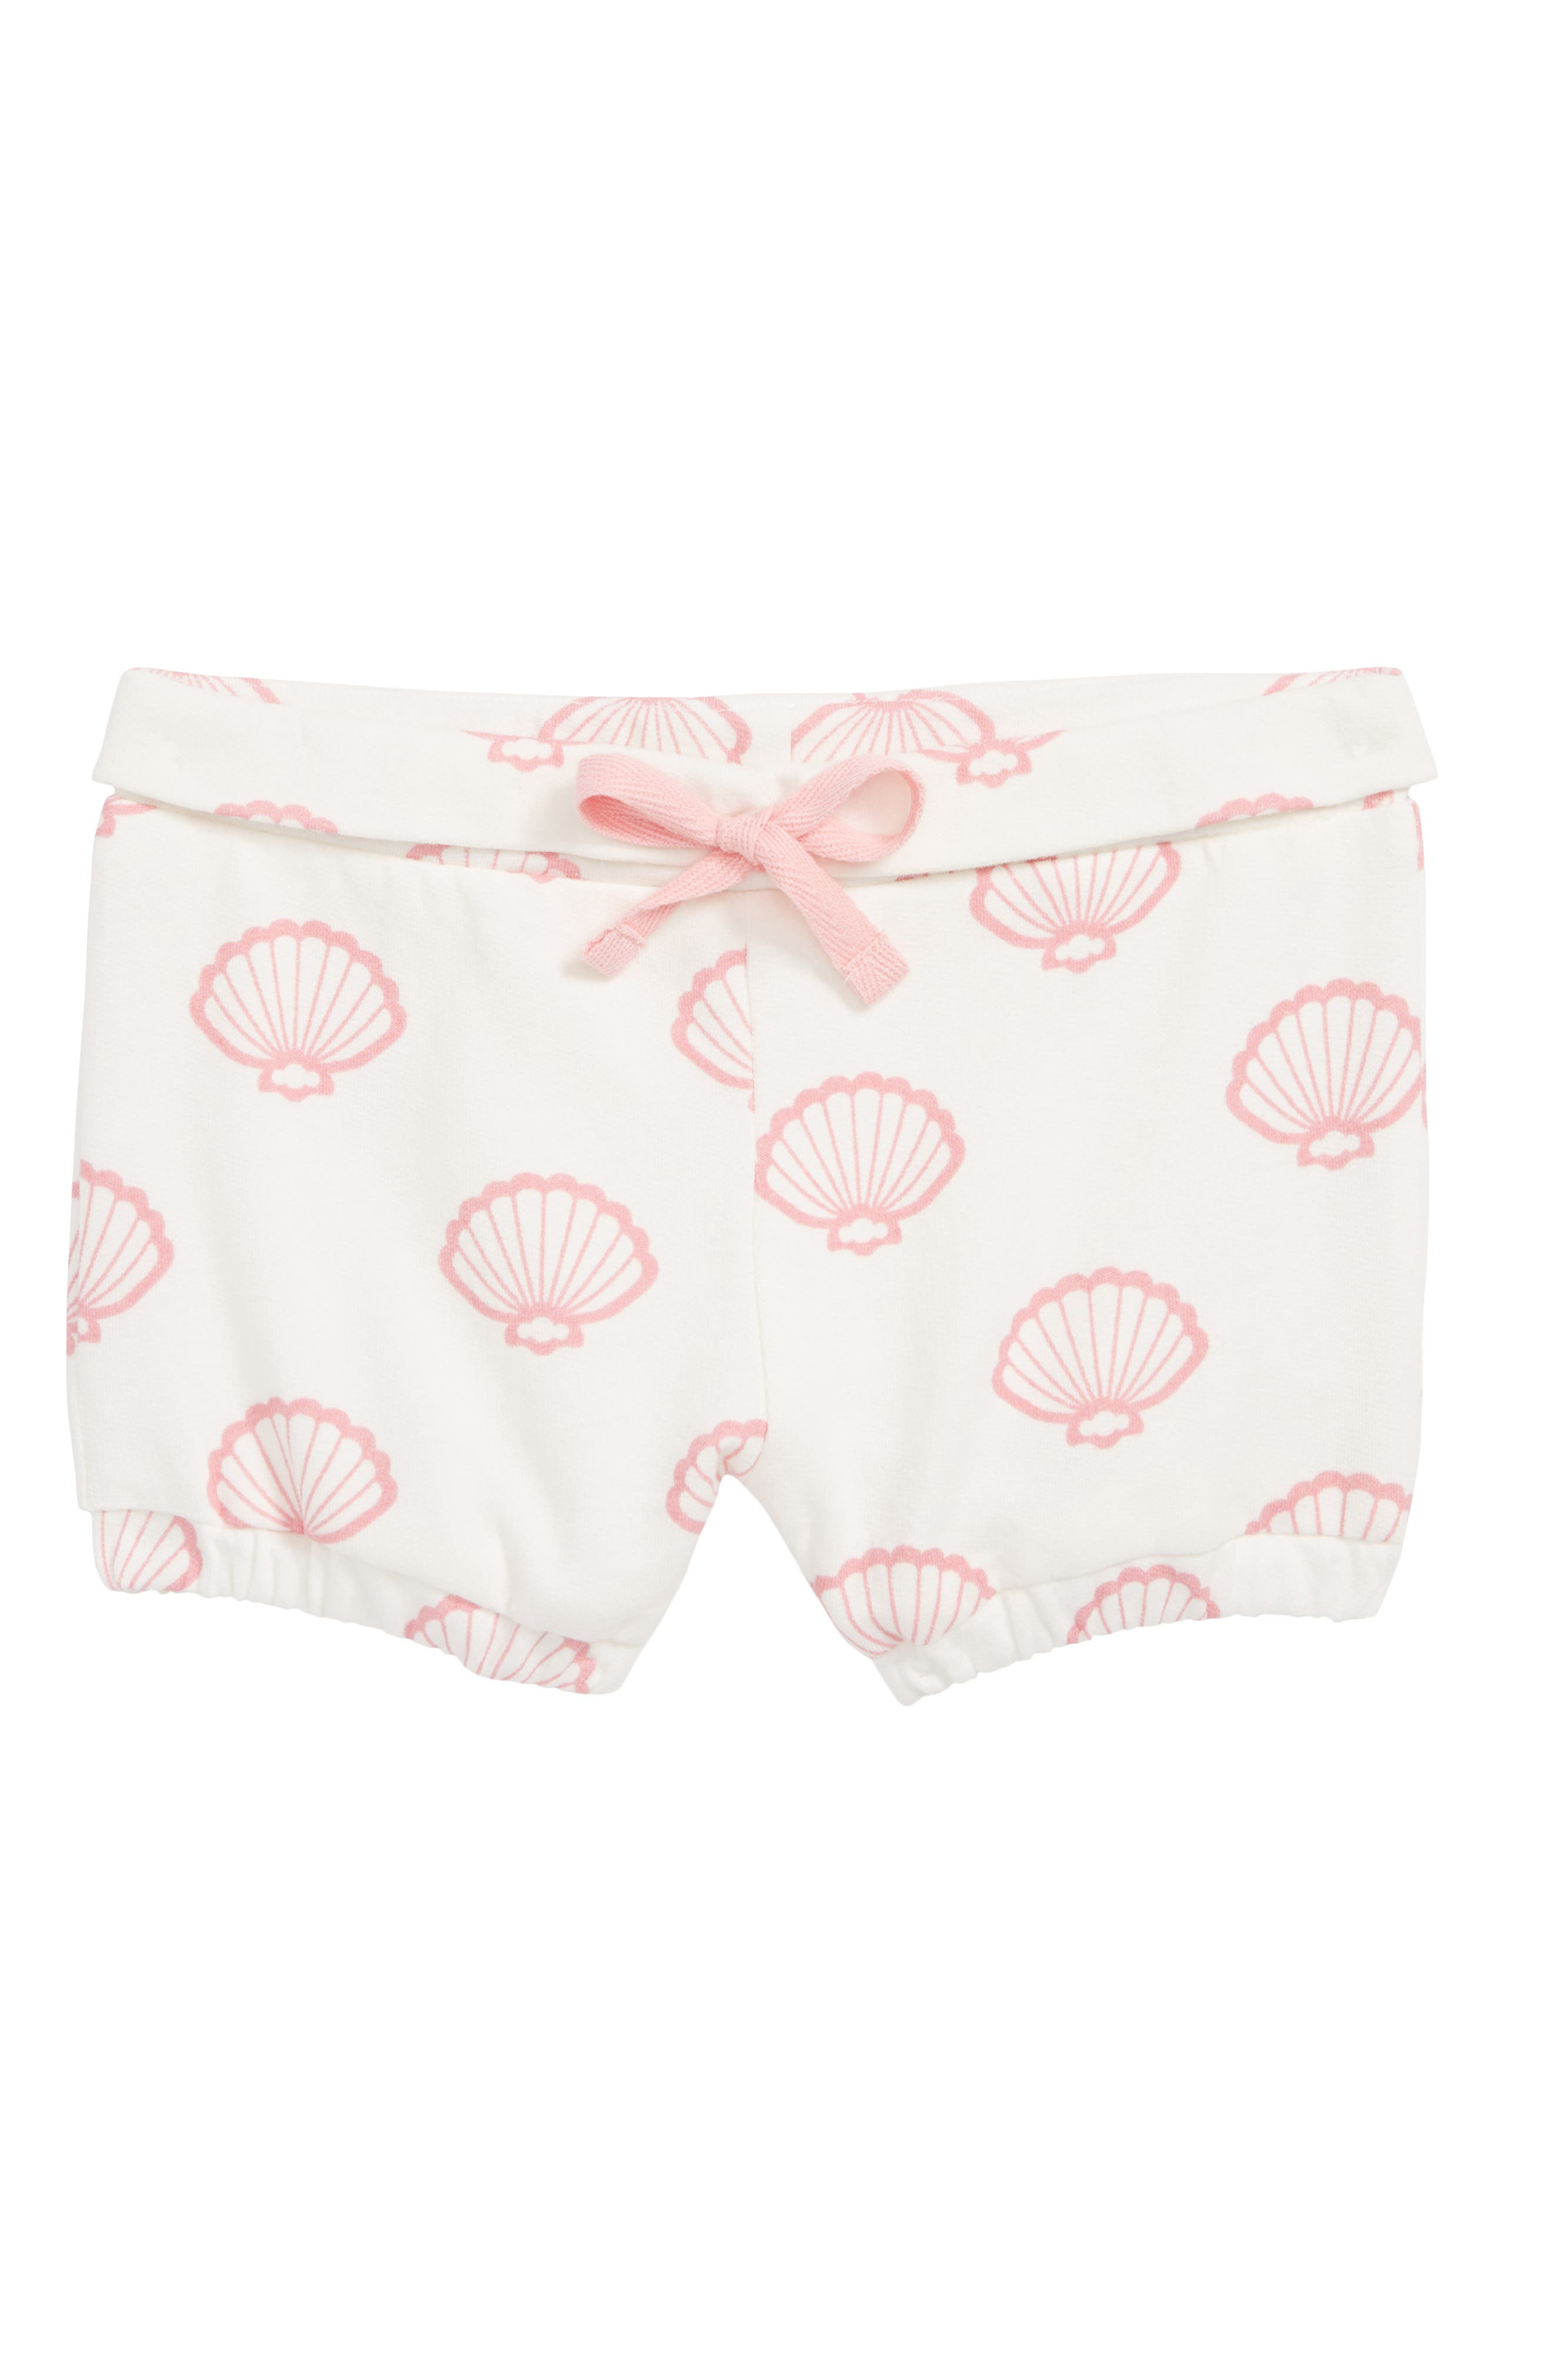 Monica + Andy Organic Cotton Knit Shorts (Baby Girls)